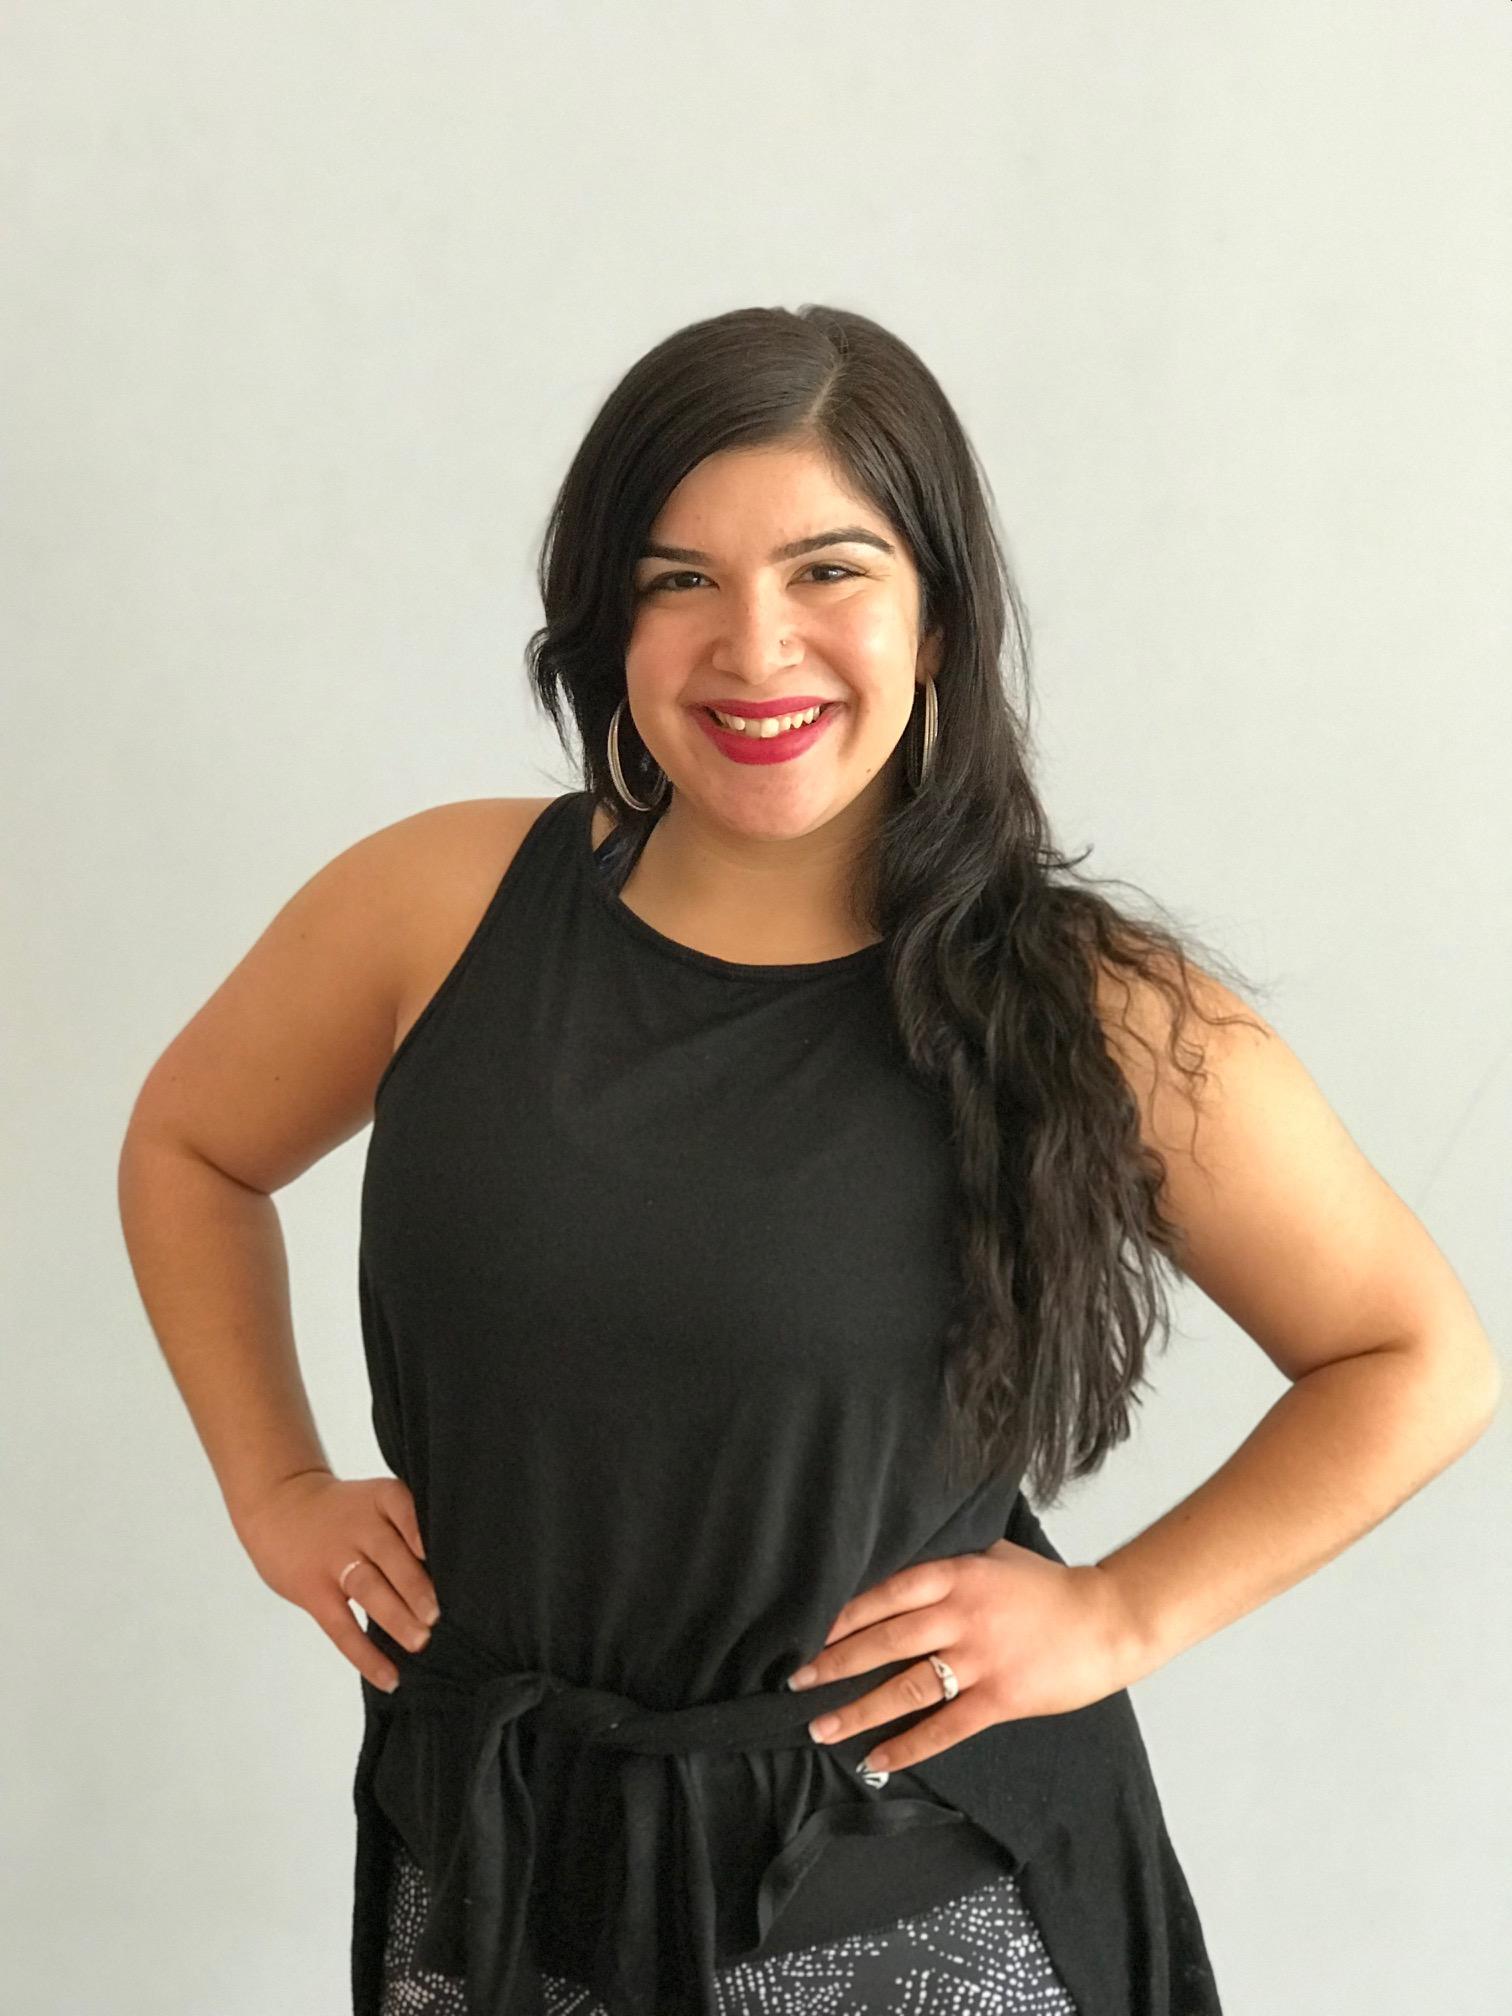 Sara, creator & lead instructor of BoldBeats Fitness!